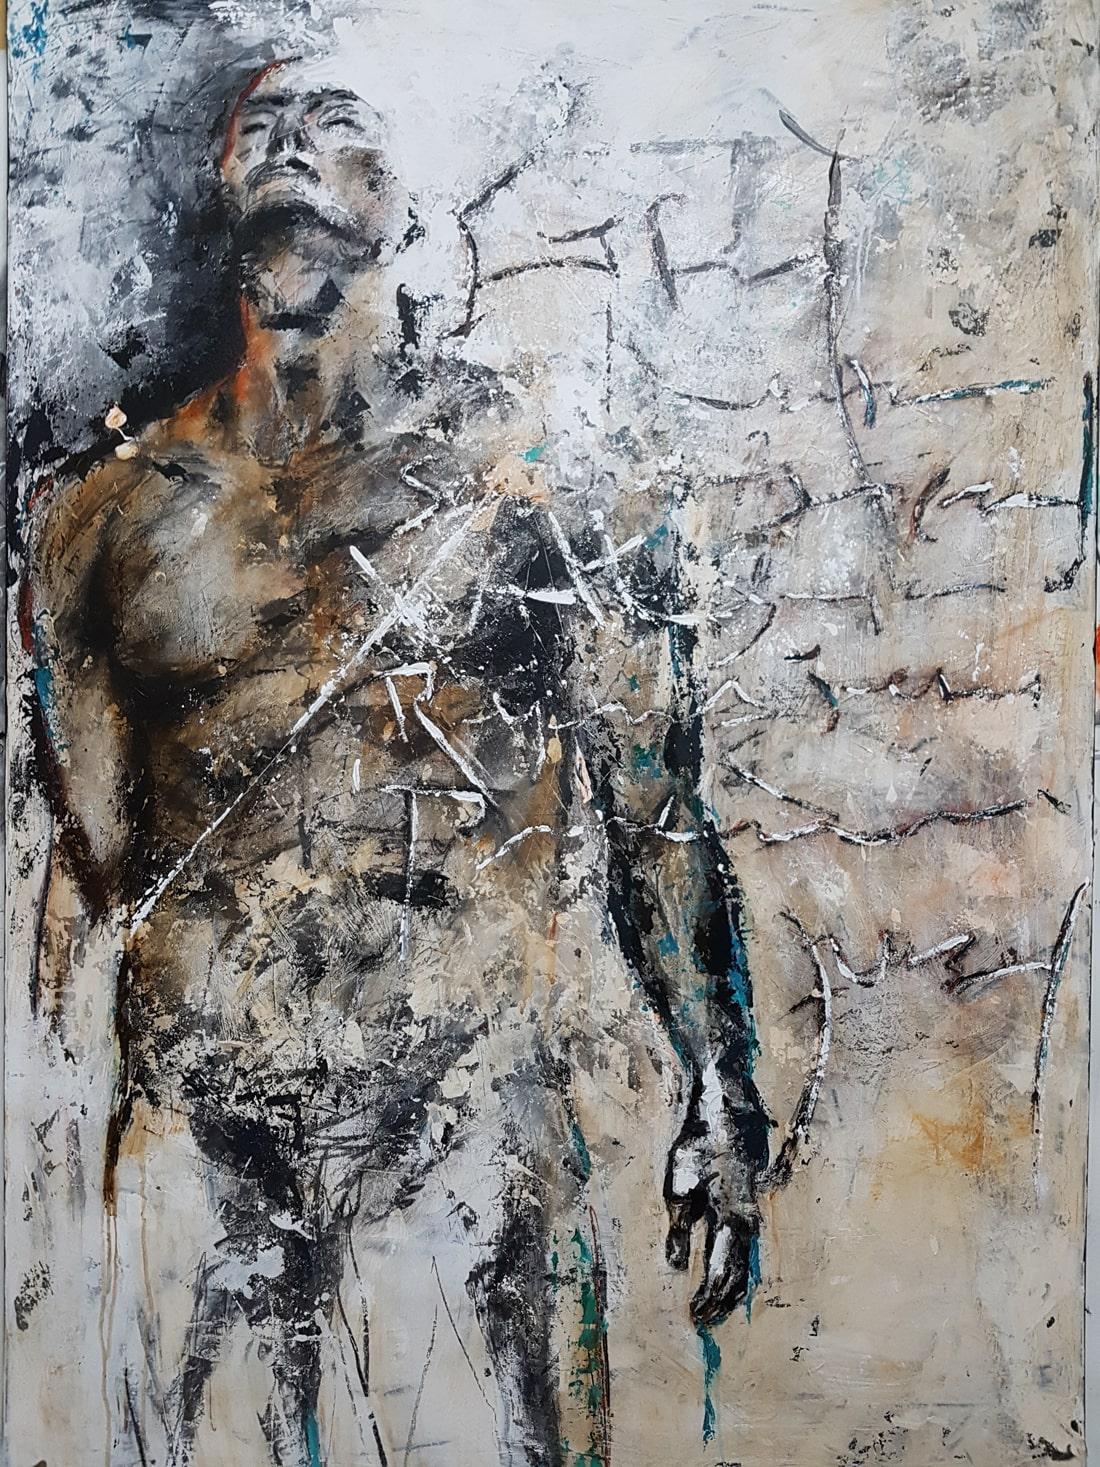 damien-rais-peinture-acrylique-defragmentation-artiste-peintre